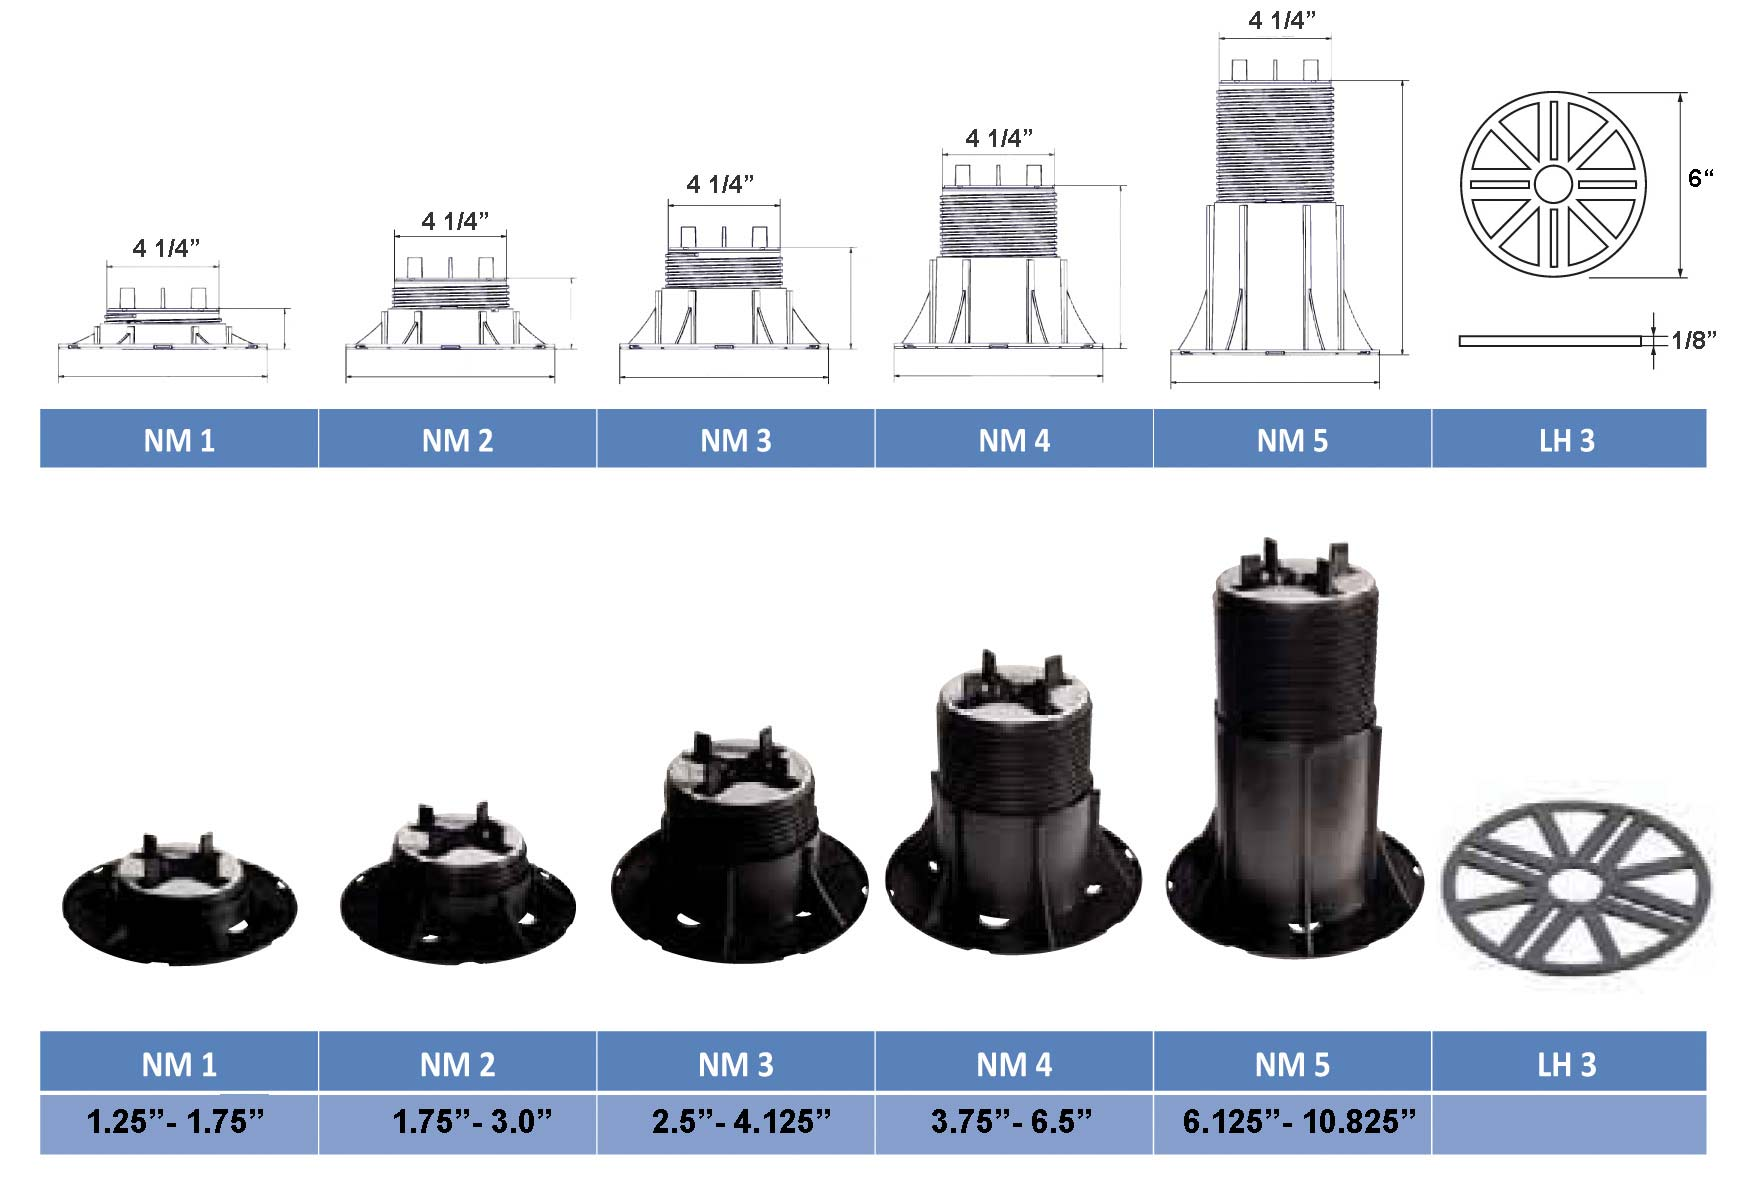 Roof Paver Pedestals Amp Paver Support System Sc 1 St The